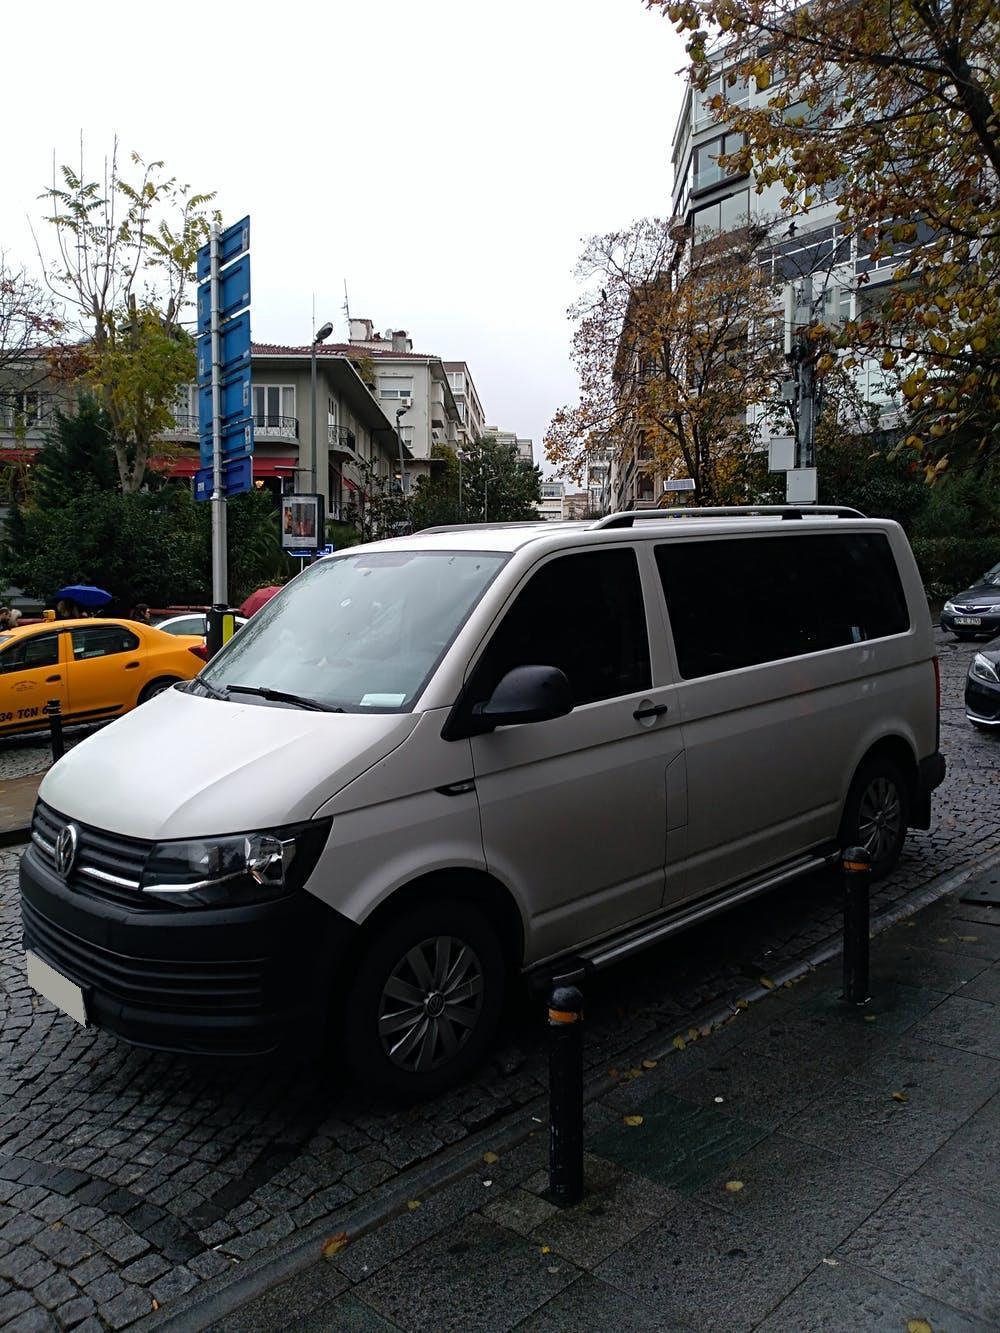 VOLKSWAGEN Transporter 2017 Model Dizel Manuel Vites Kiralik Araç - 8102